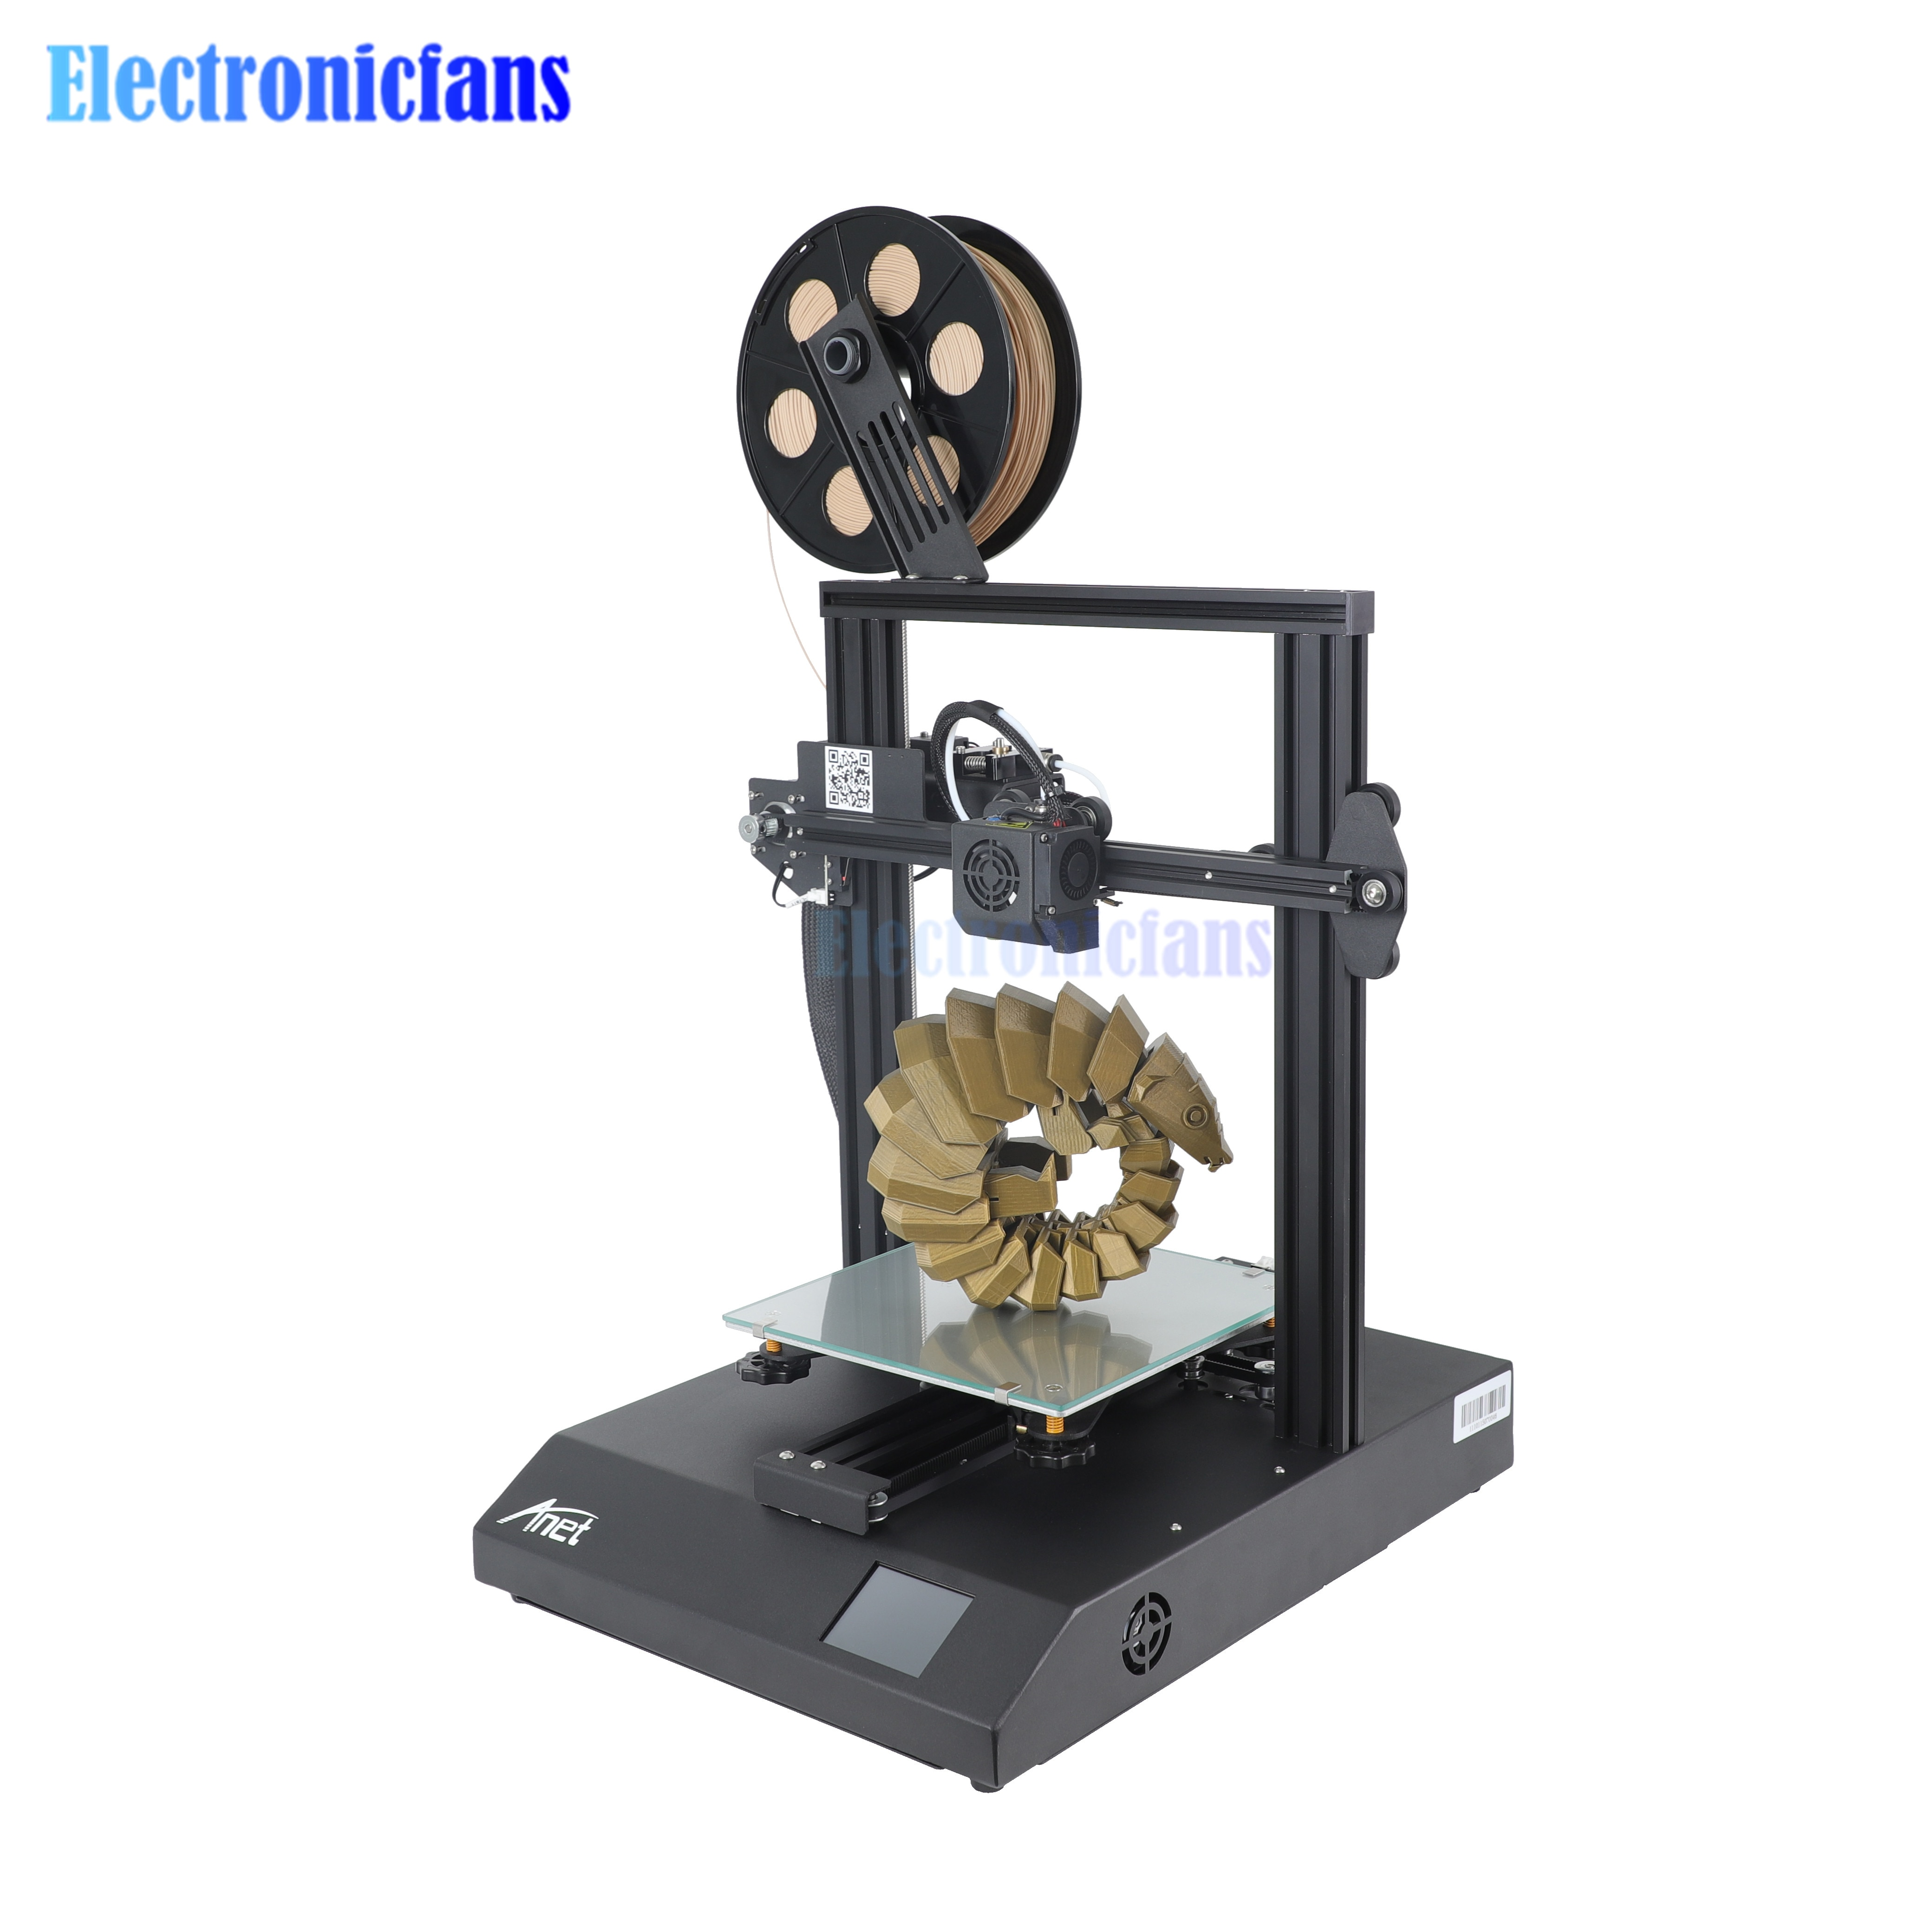 High Precision Anet ET4 Pro 3D Printer TMC2208 Support Resume Power Failure Printing 220*220*250mm Desktop 3d Printer DIY Kit